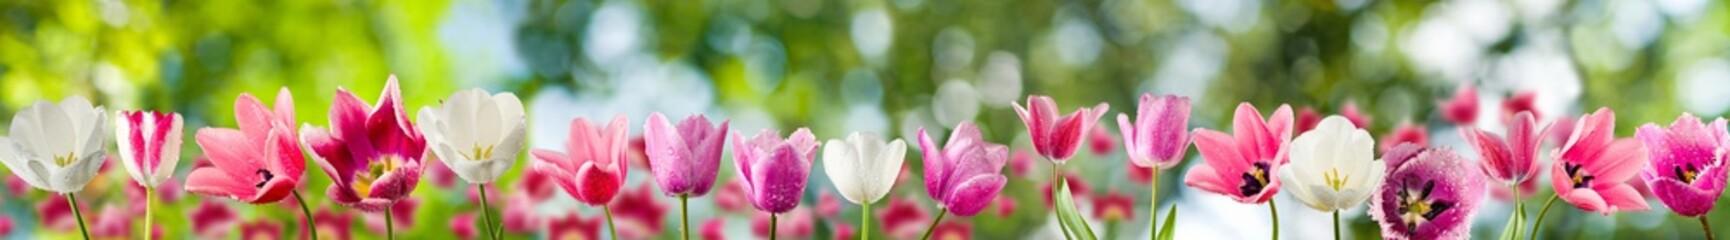 Image of tulips closeup